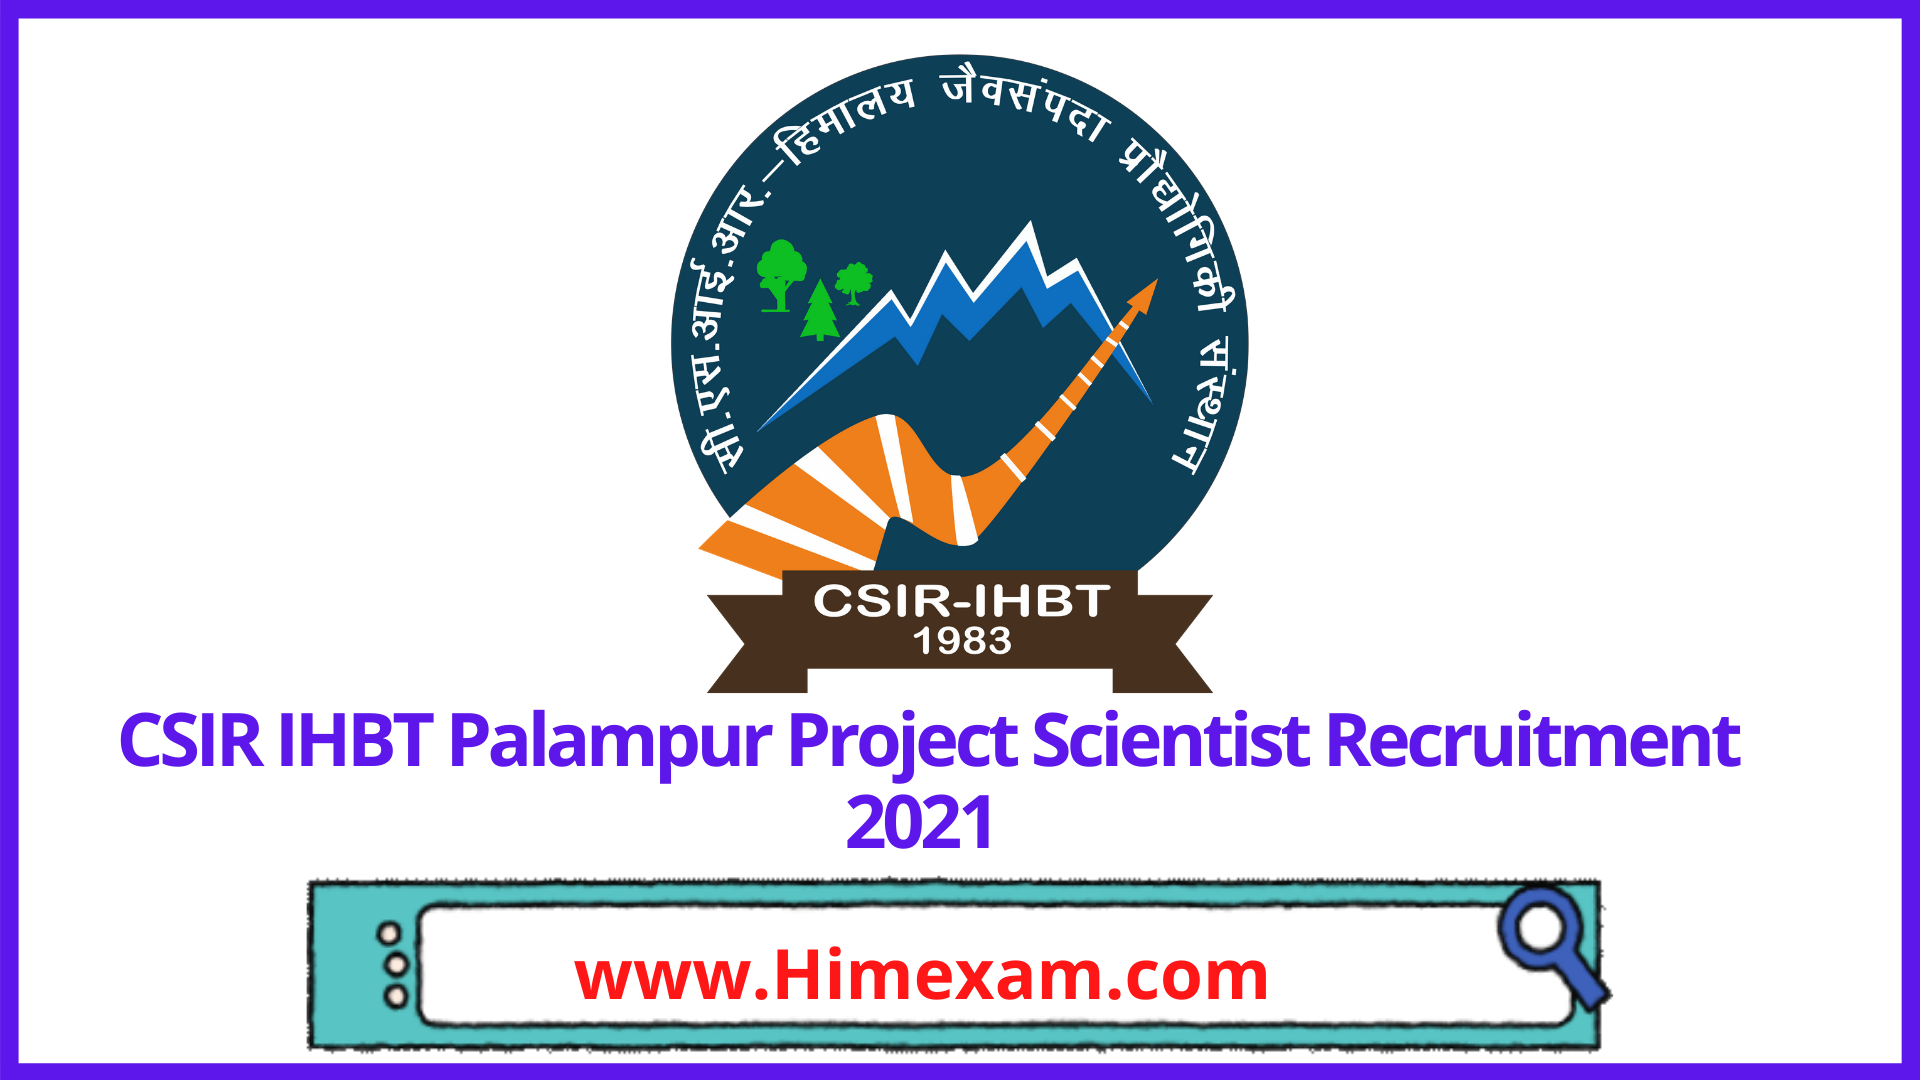 CSIR IHBT Palampur Project Scientist Recruitment 2021